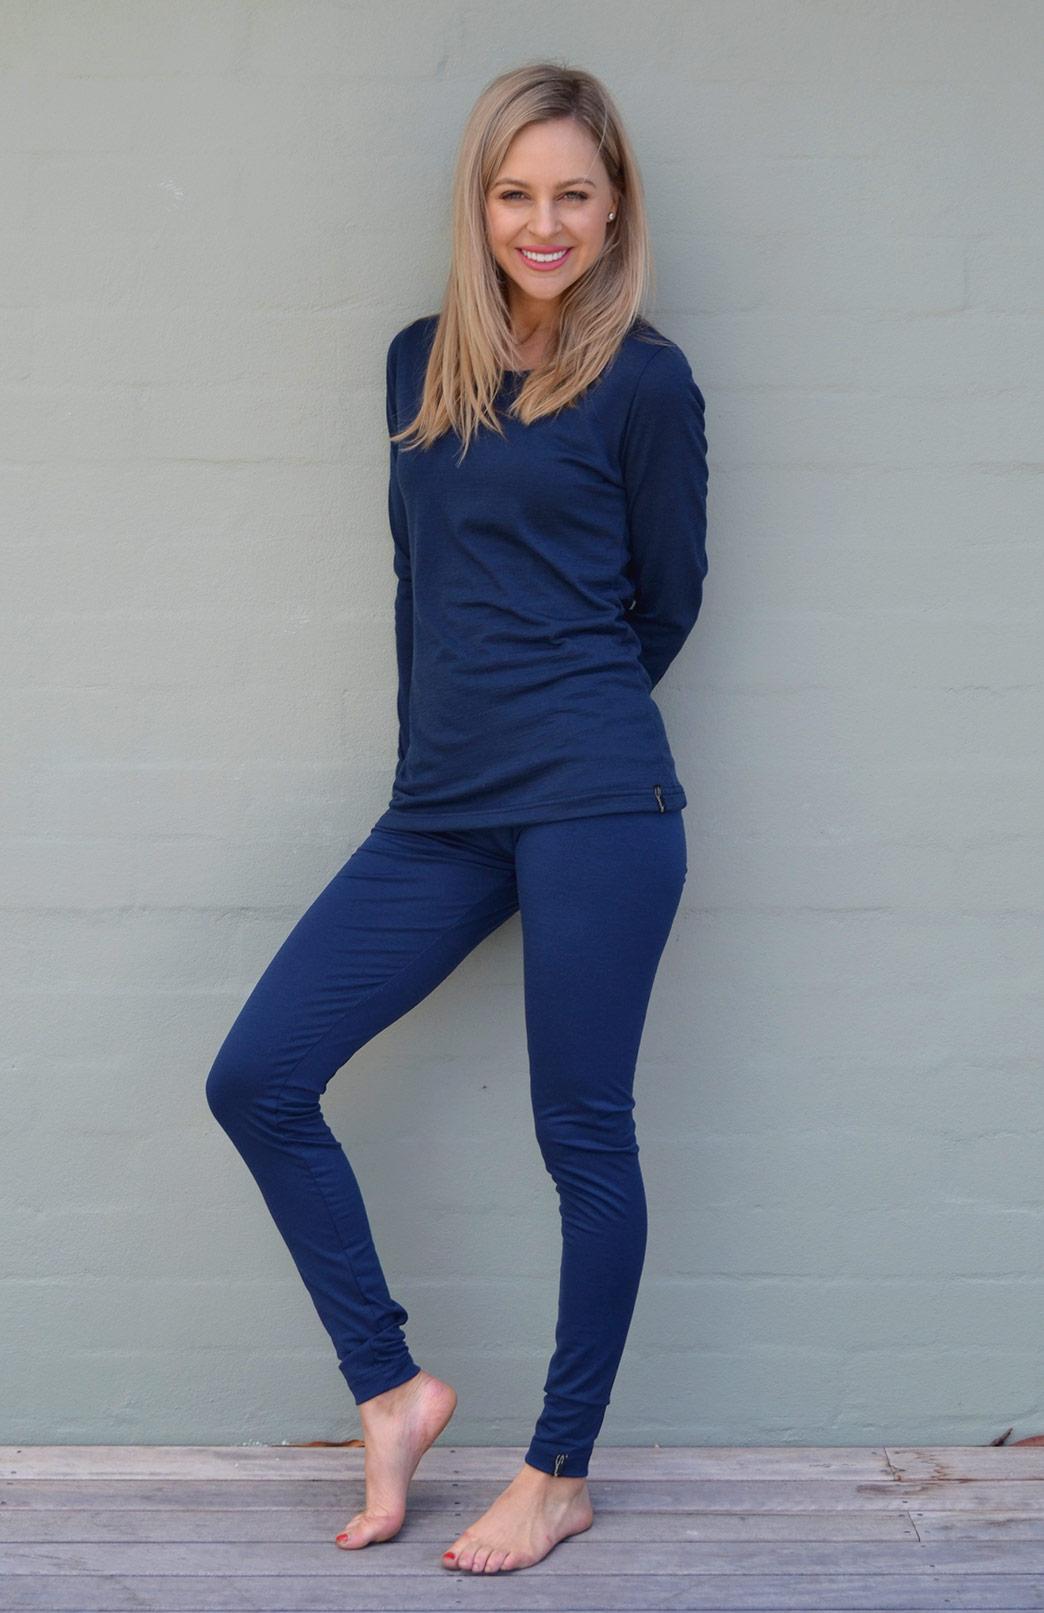 High Waisted Leggings - Lightweight - Women's Indigo Blue Wool High Waisted Leggings with no pockets or fastenings - Smitten Merino Tasmania Australia